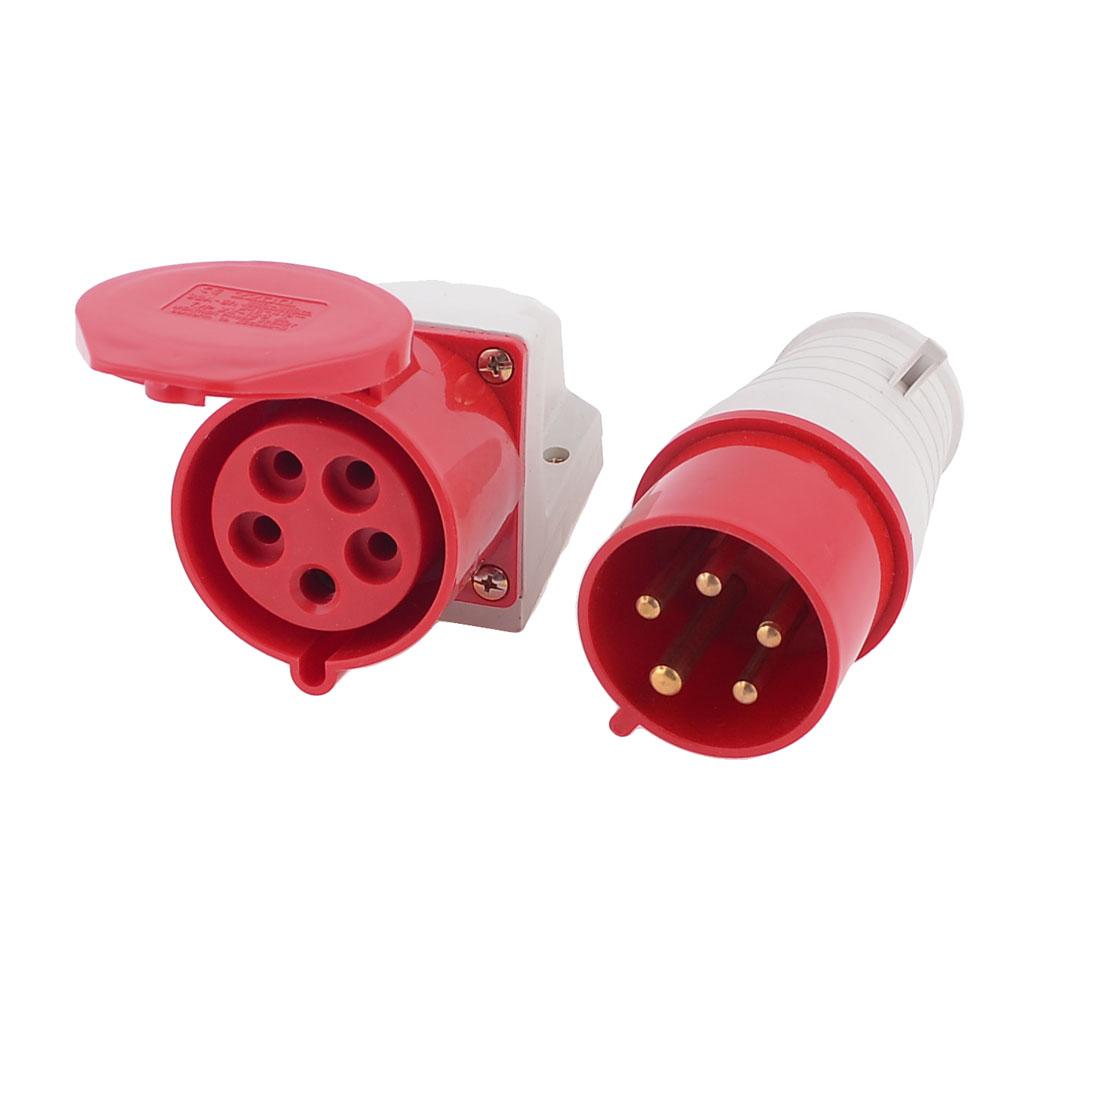 32A 220-380V 4P+E IEC309-2 5 Pin w Waterproof Coupler Contector Socket